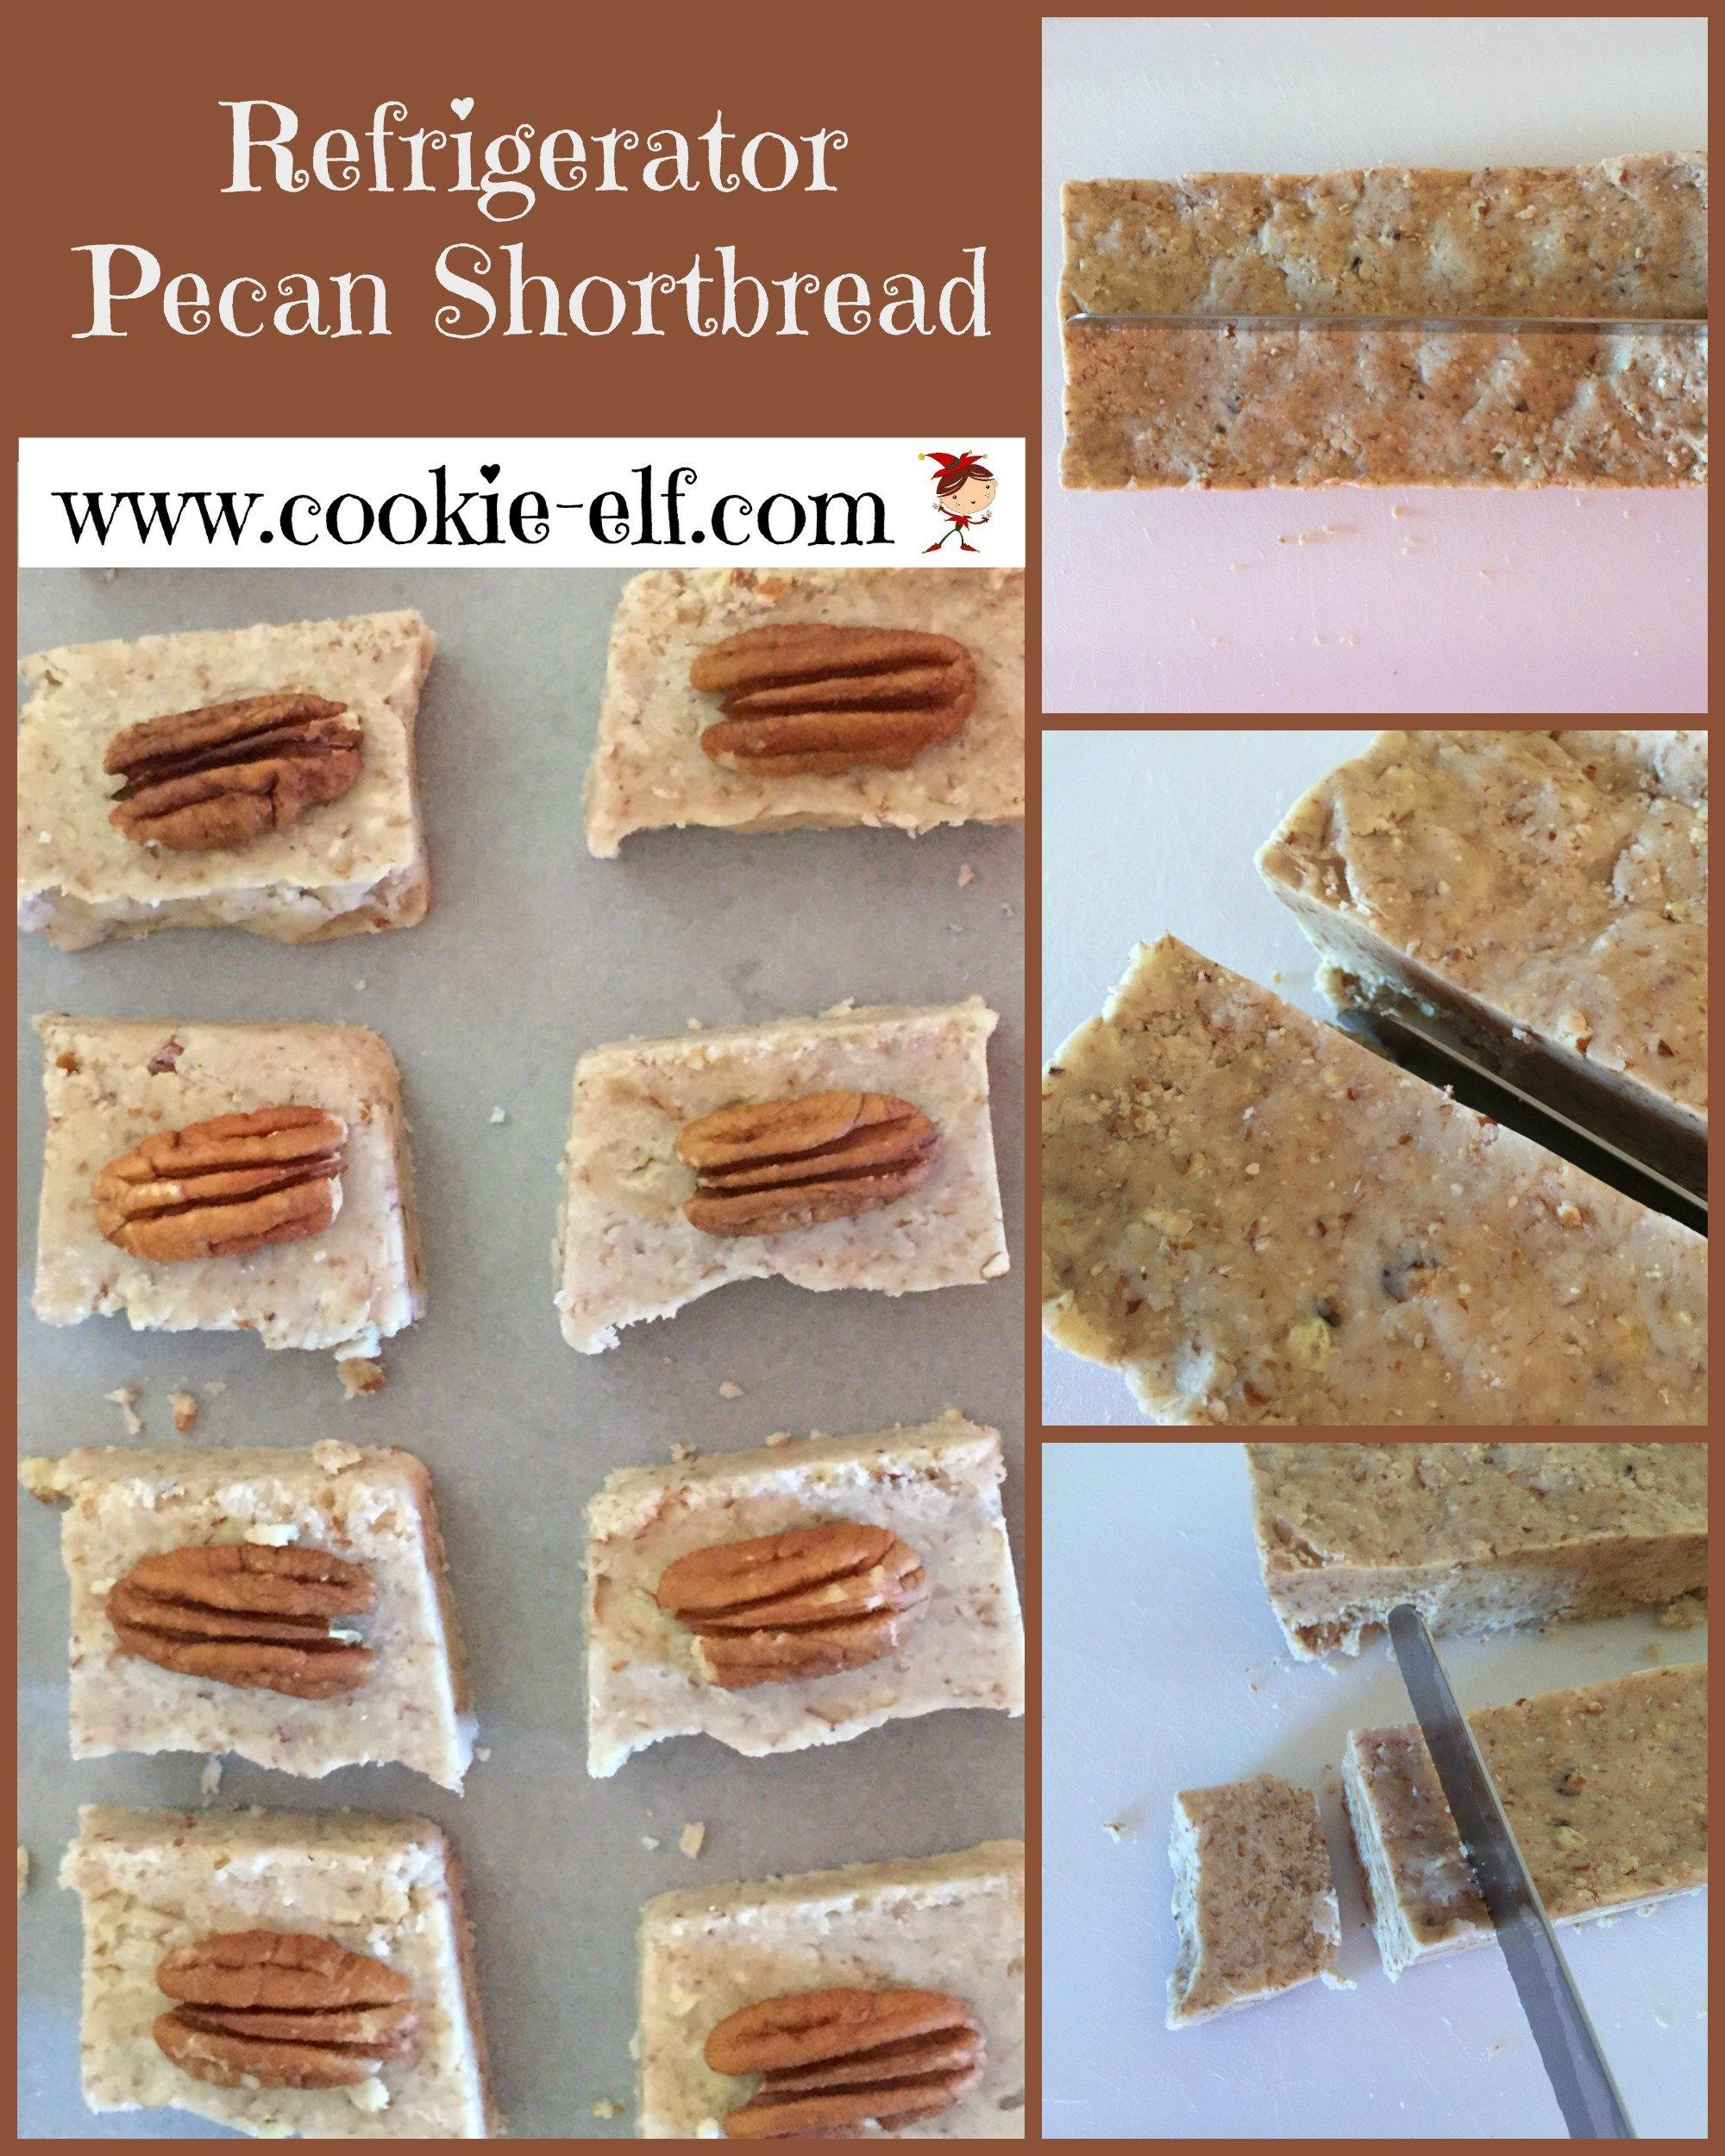 Refrigerator Pecan Shortbread from The Cookie Elf